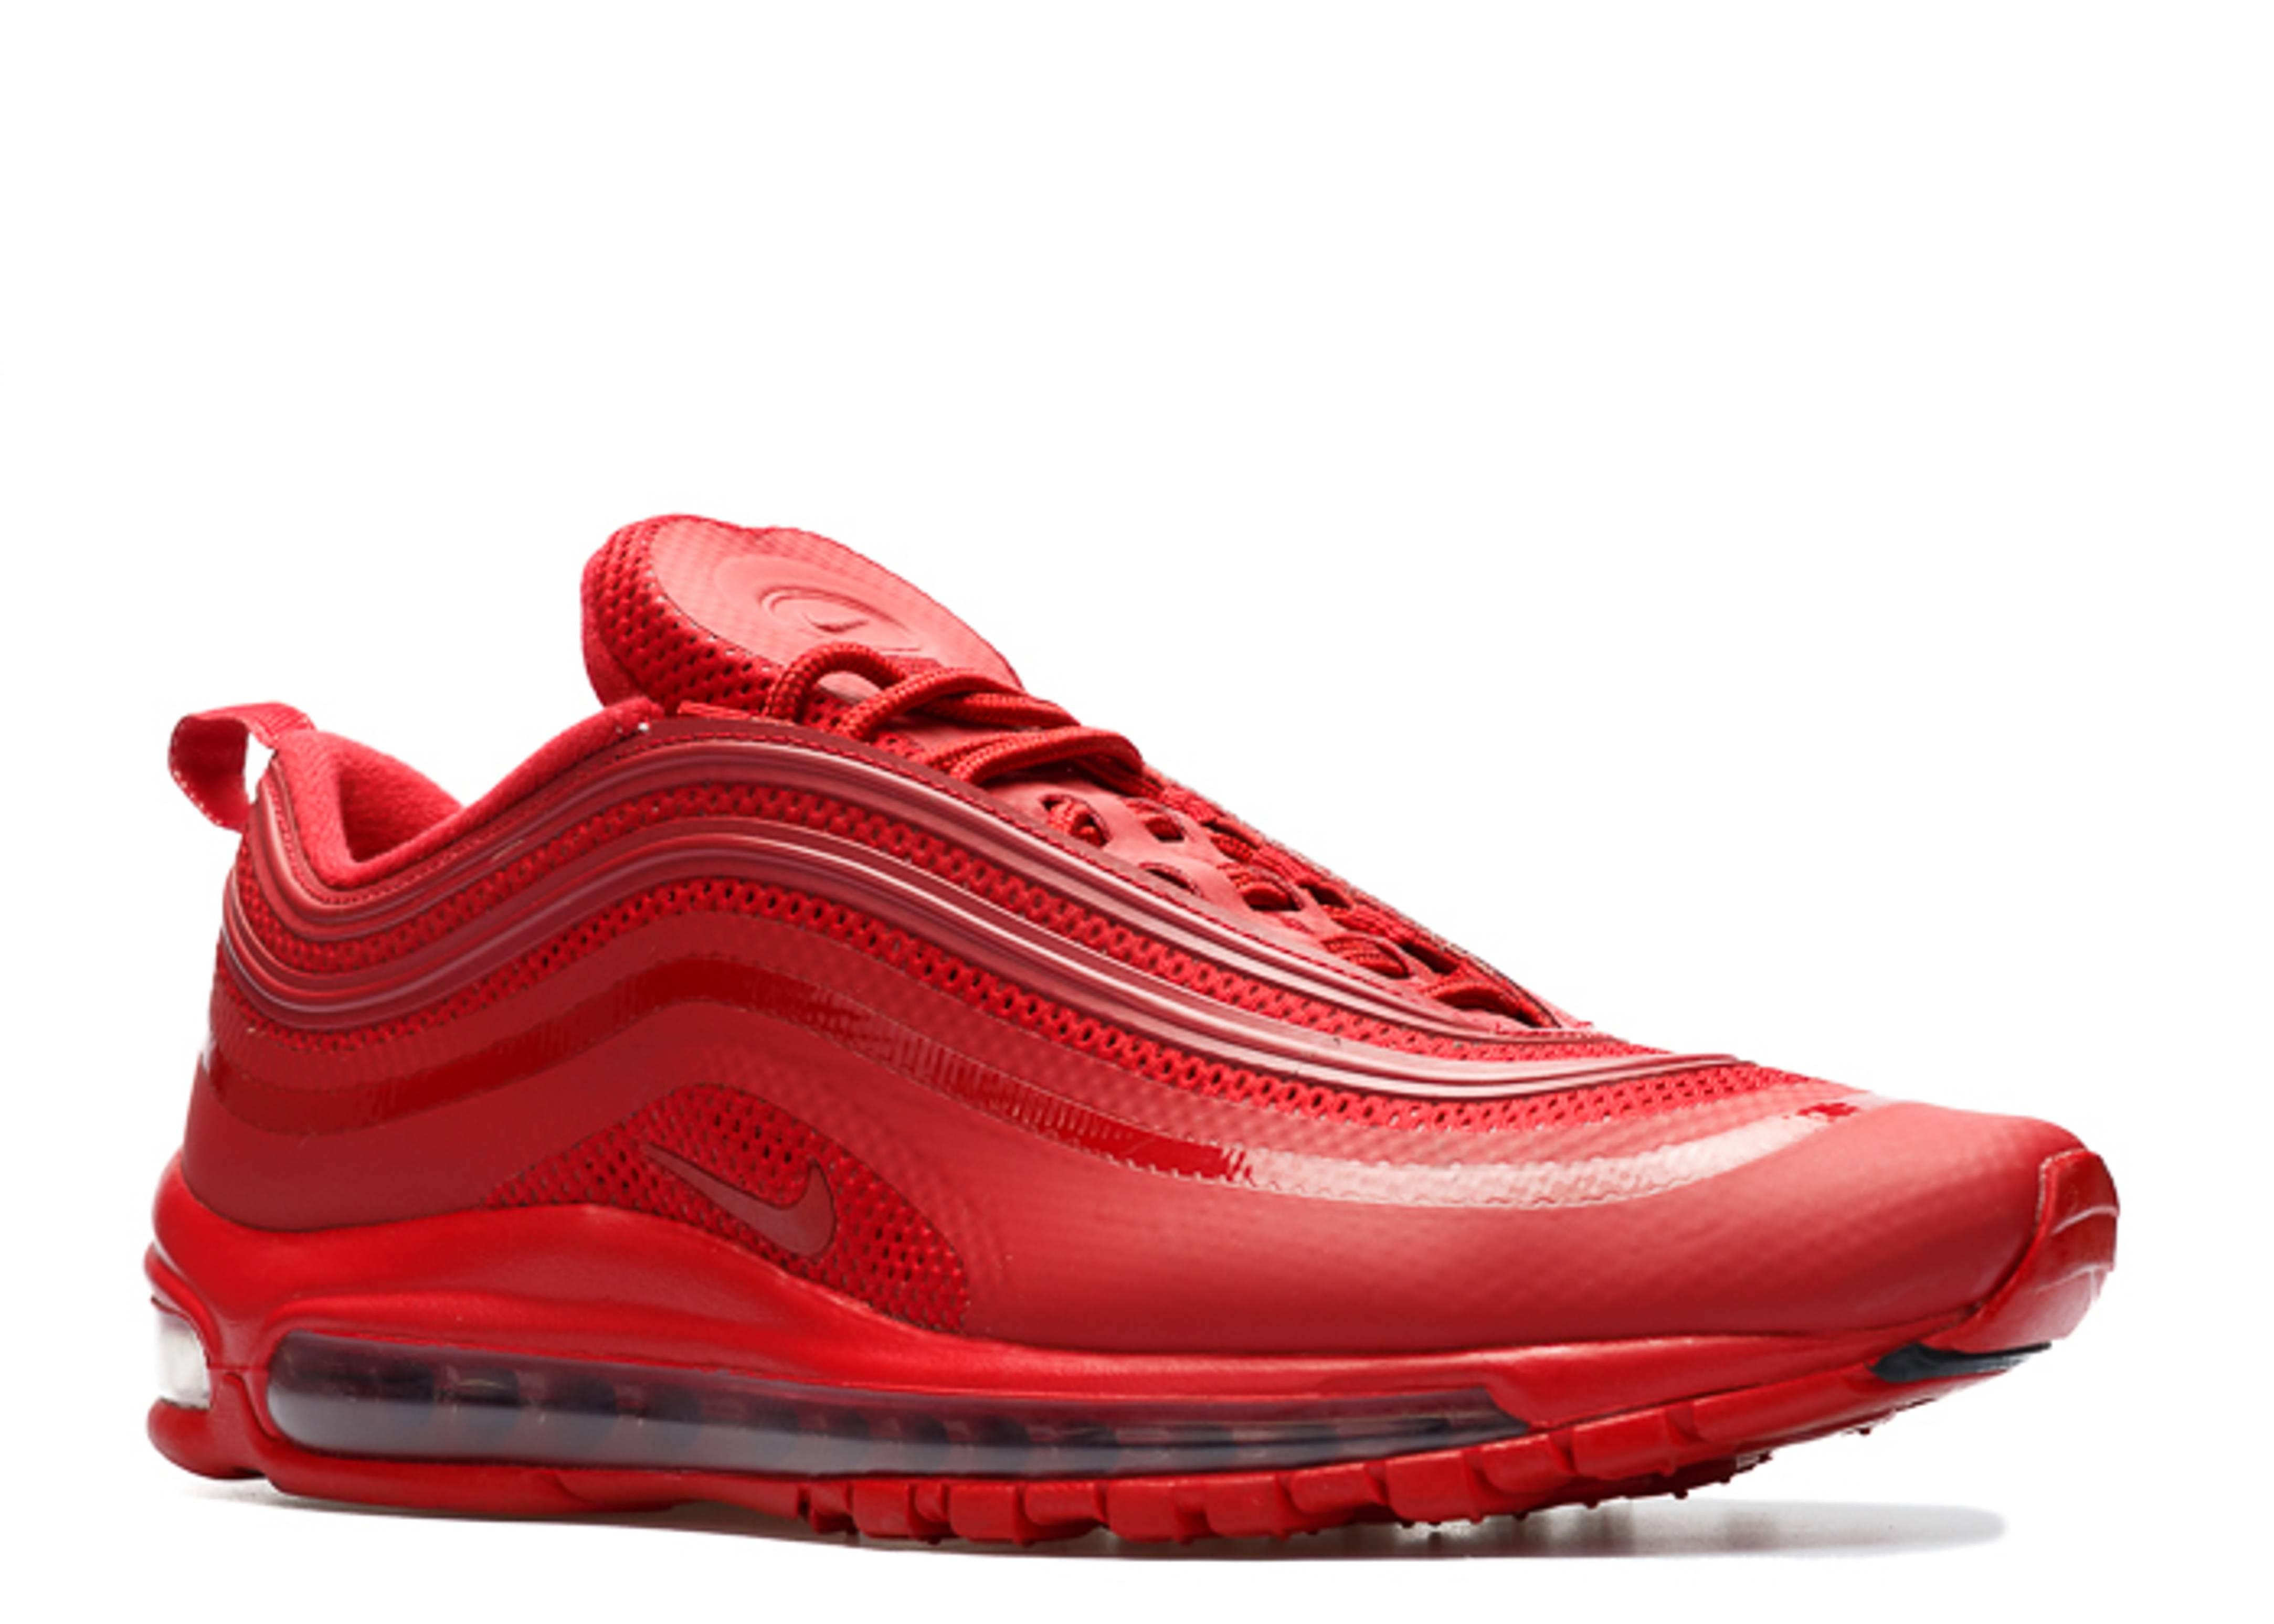 8b3635df13 Air Max 97 Hyperfuse - Nike - 518160 661 - gym red/gym red-black-ntrl gry |  Flight Club